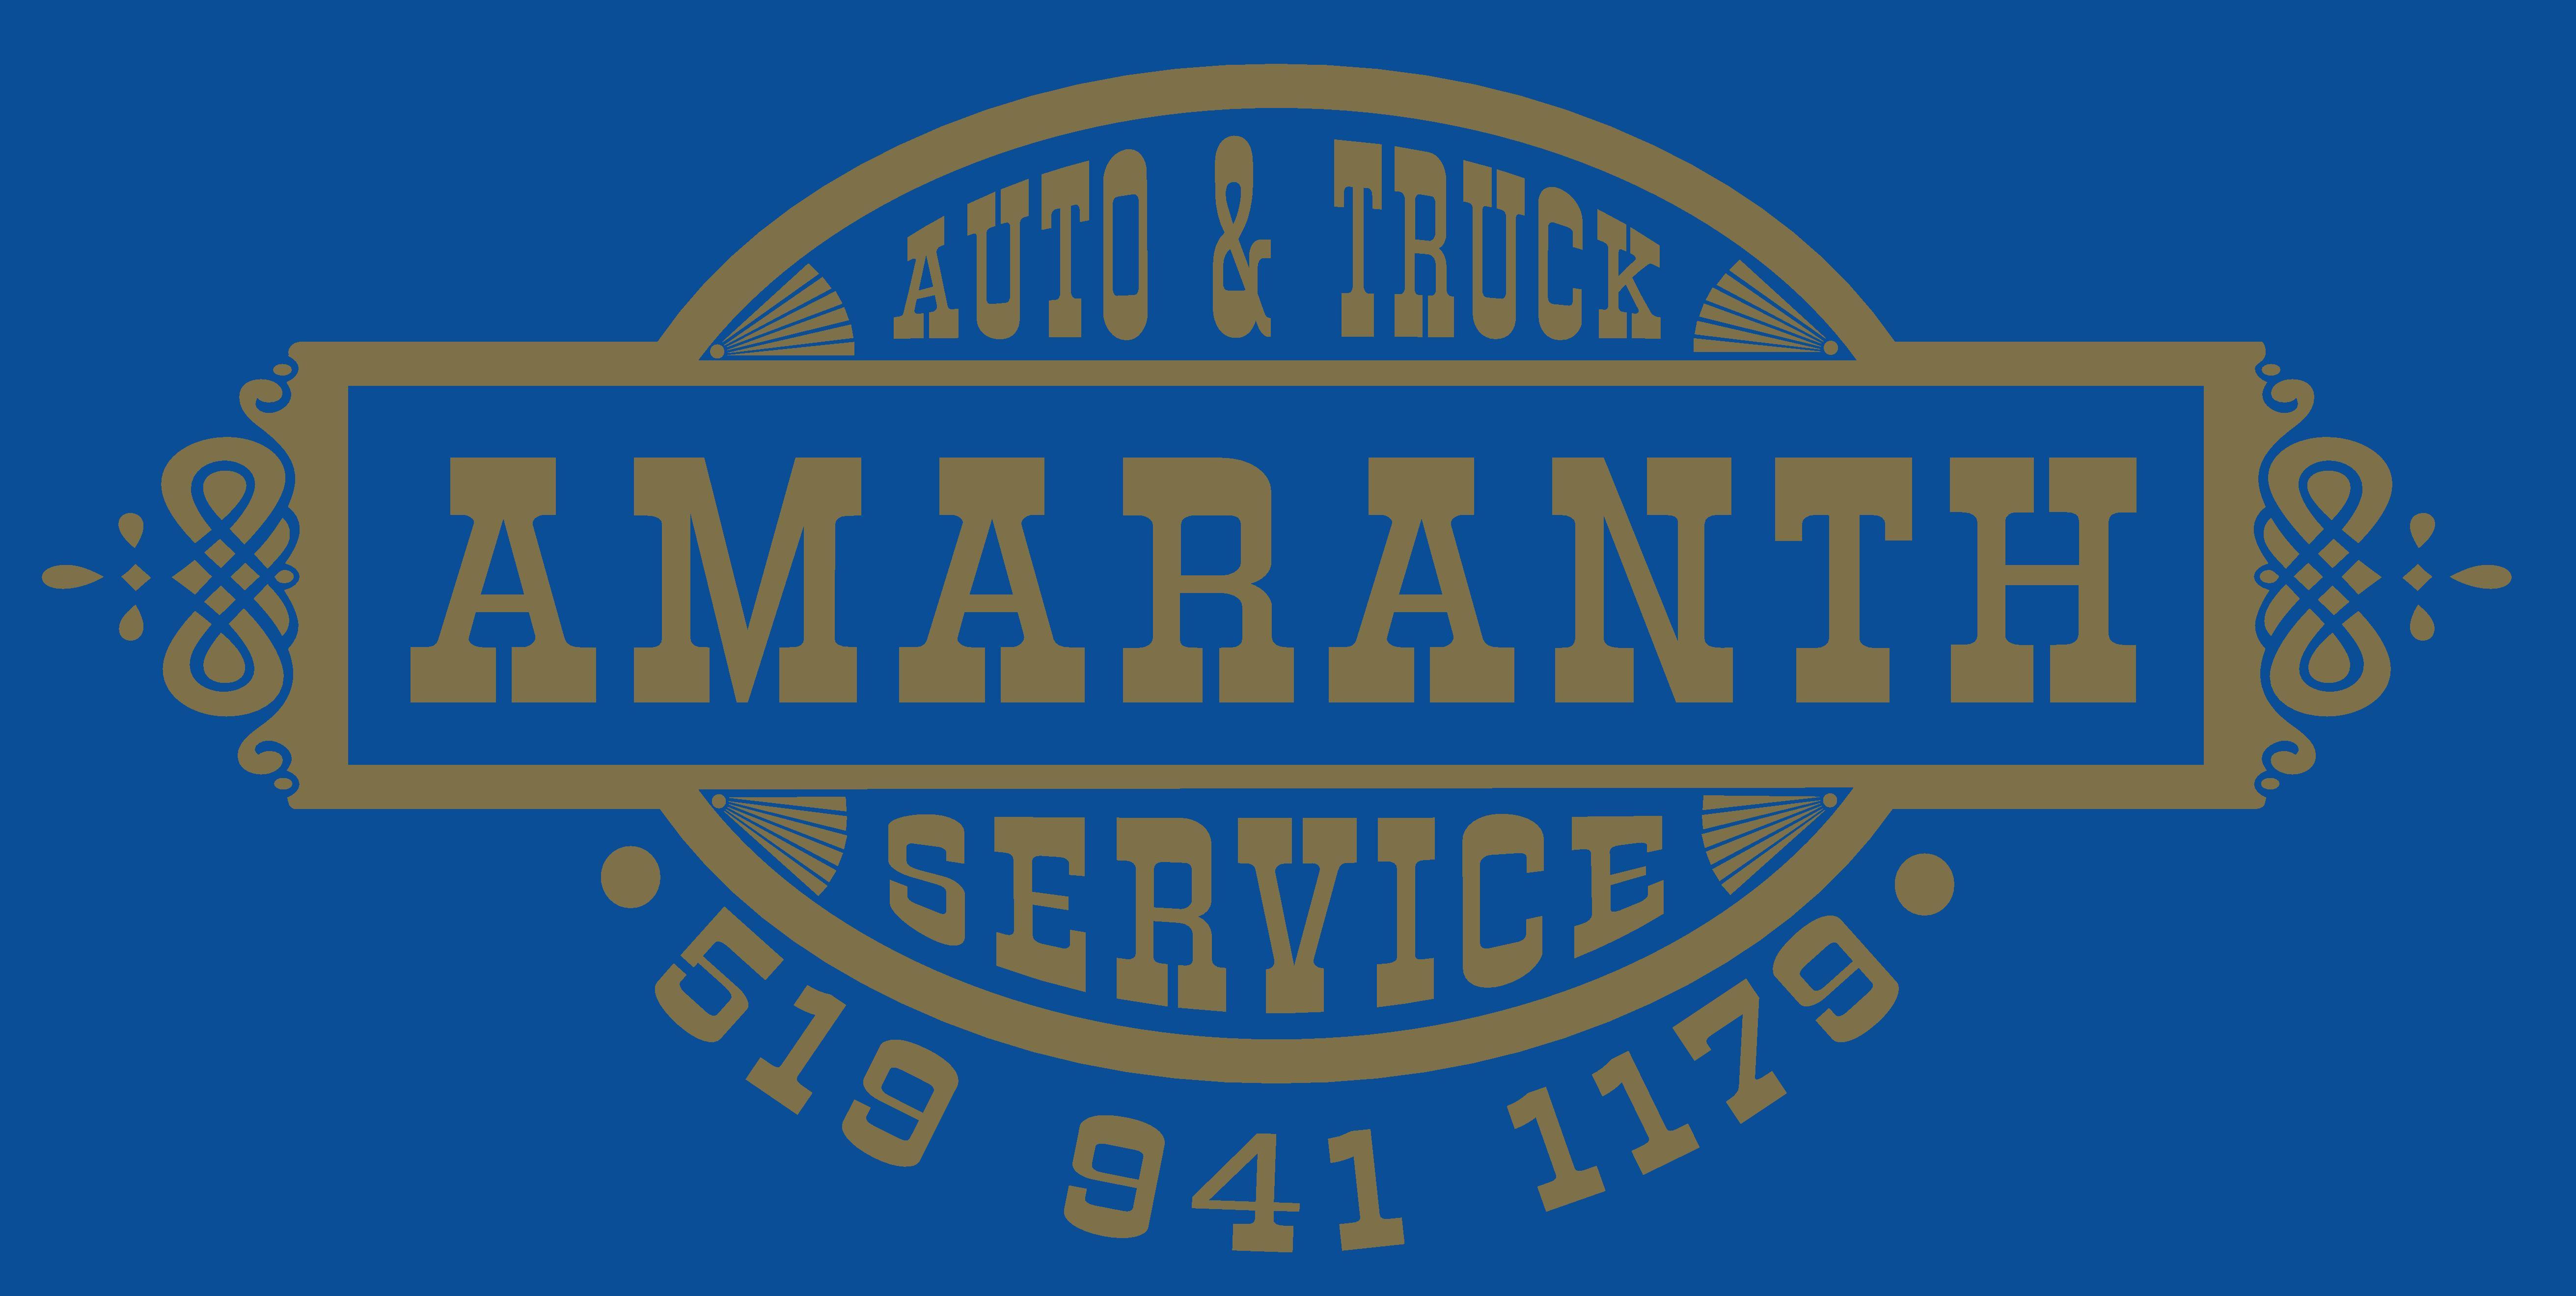 Amaranth Auto Service